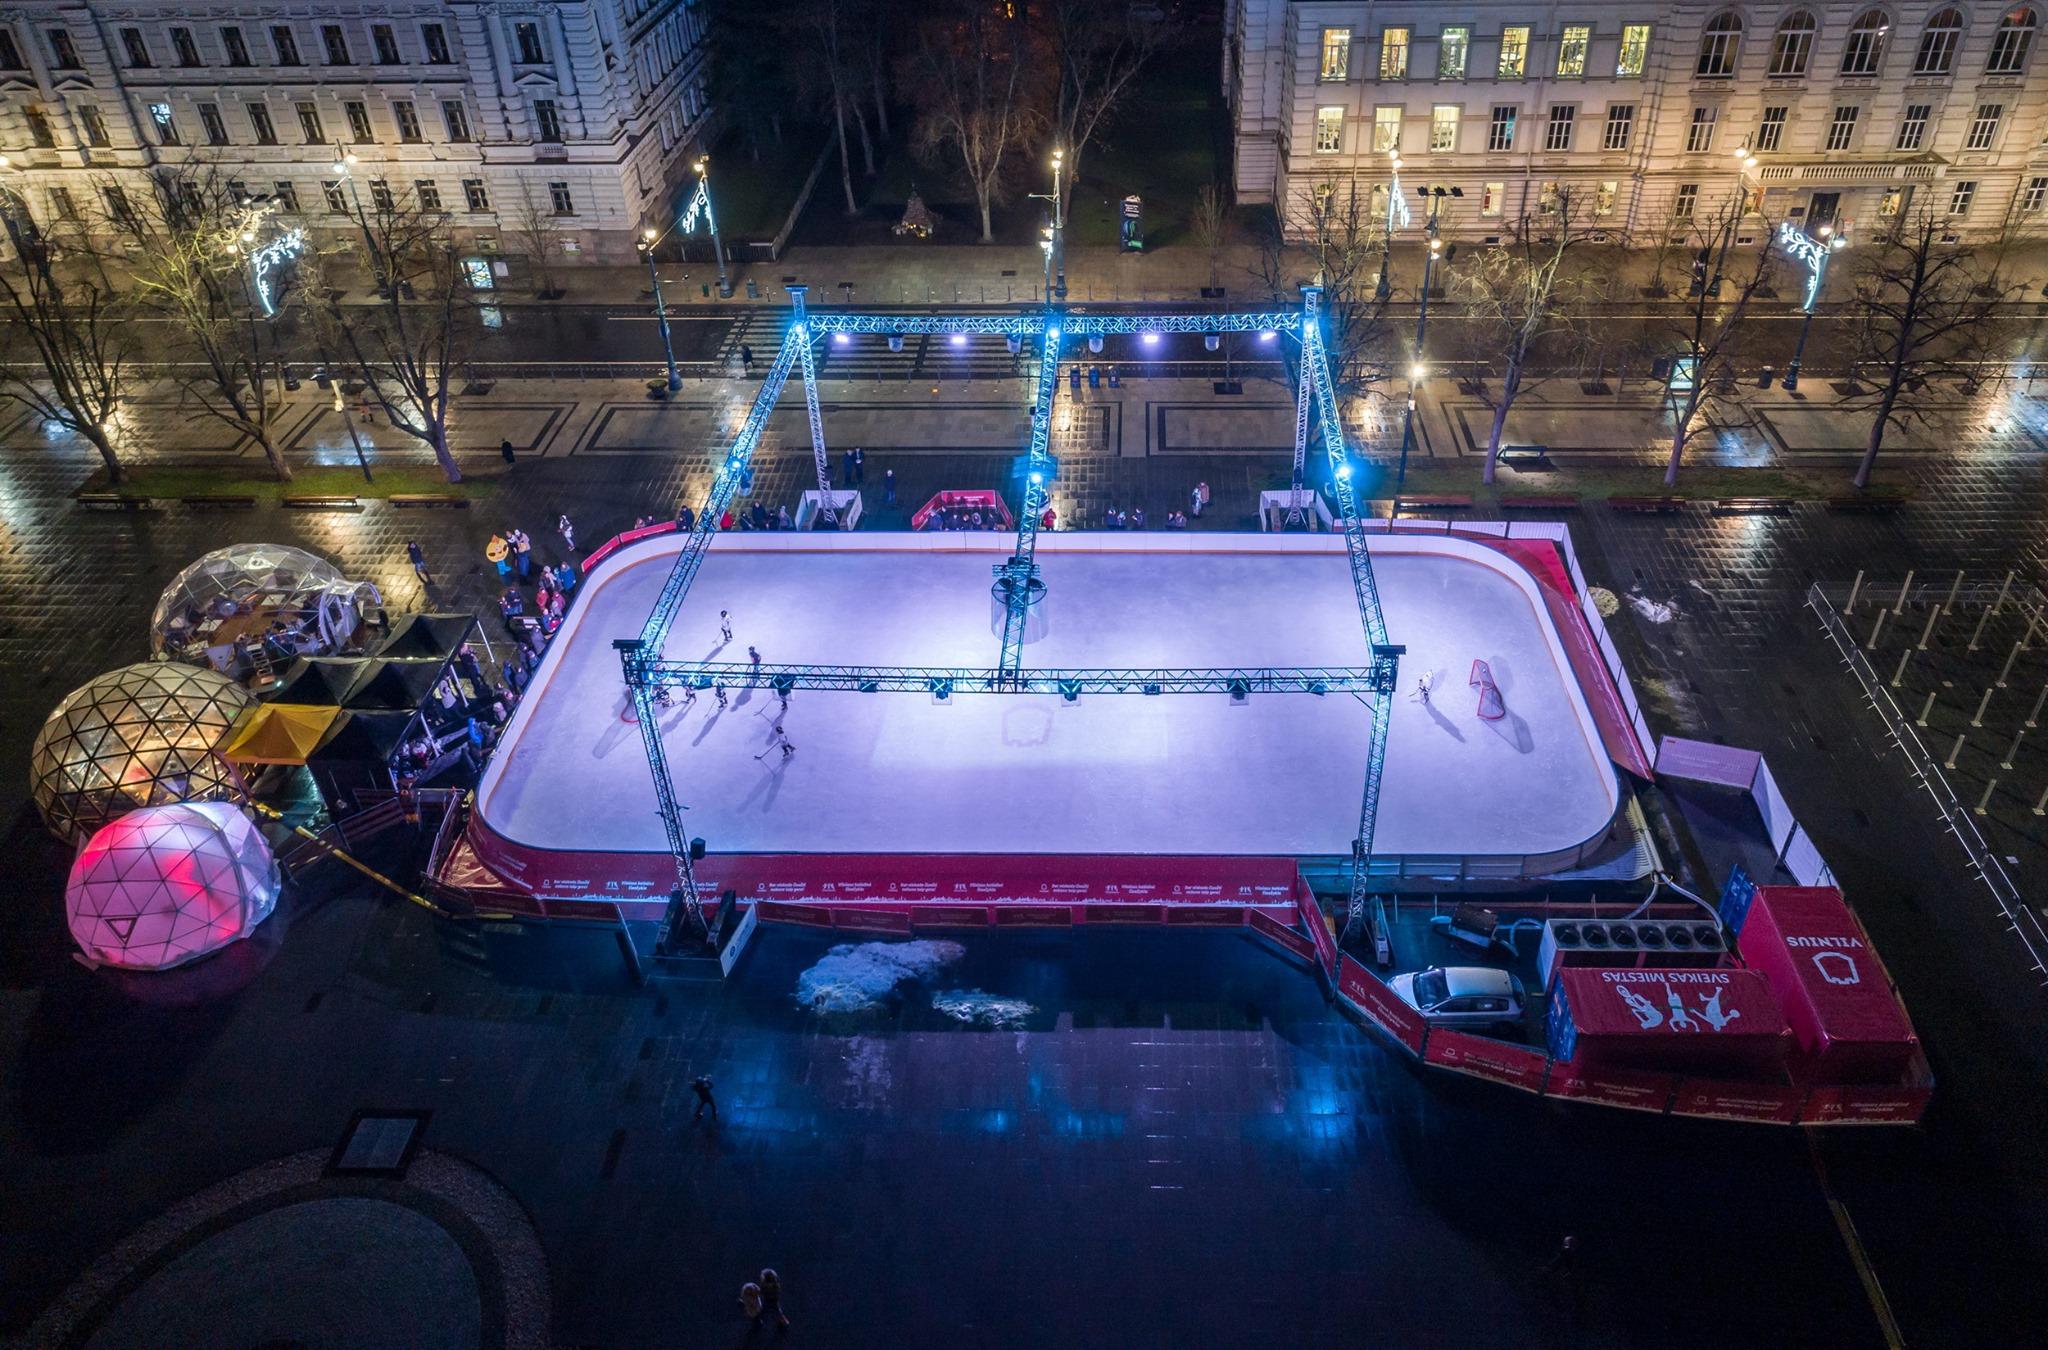 50m² Panoramic Bar Glamping Dome Ø8m | Ice rink in Lukiškės Square, Vilnius